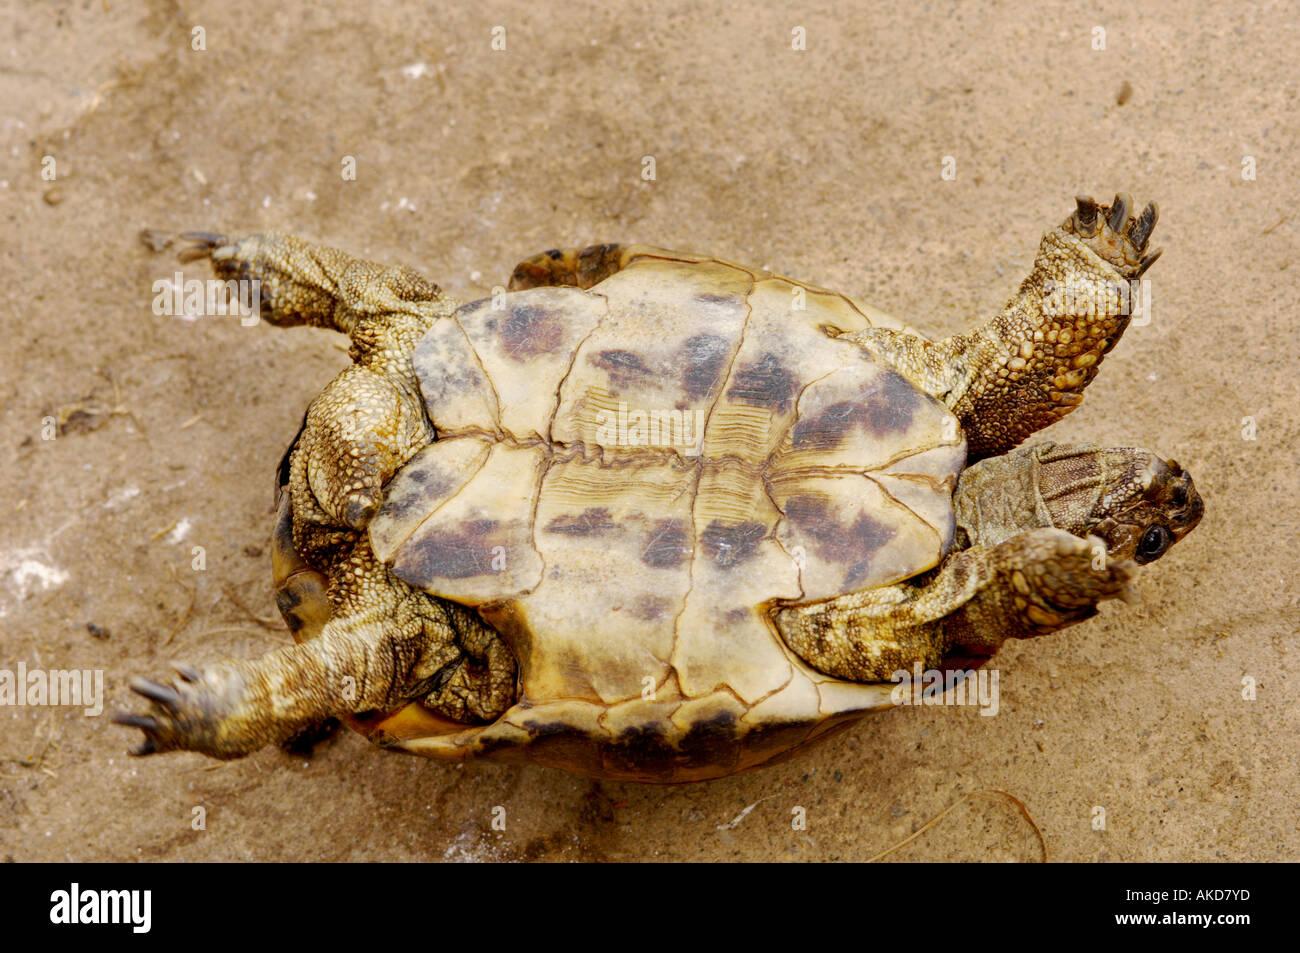 Warning turtles amp tortoises inc - Tortoise On Back Unable To Right Itself Stock Image